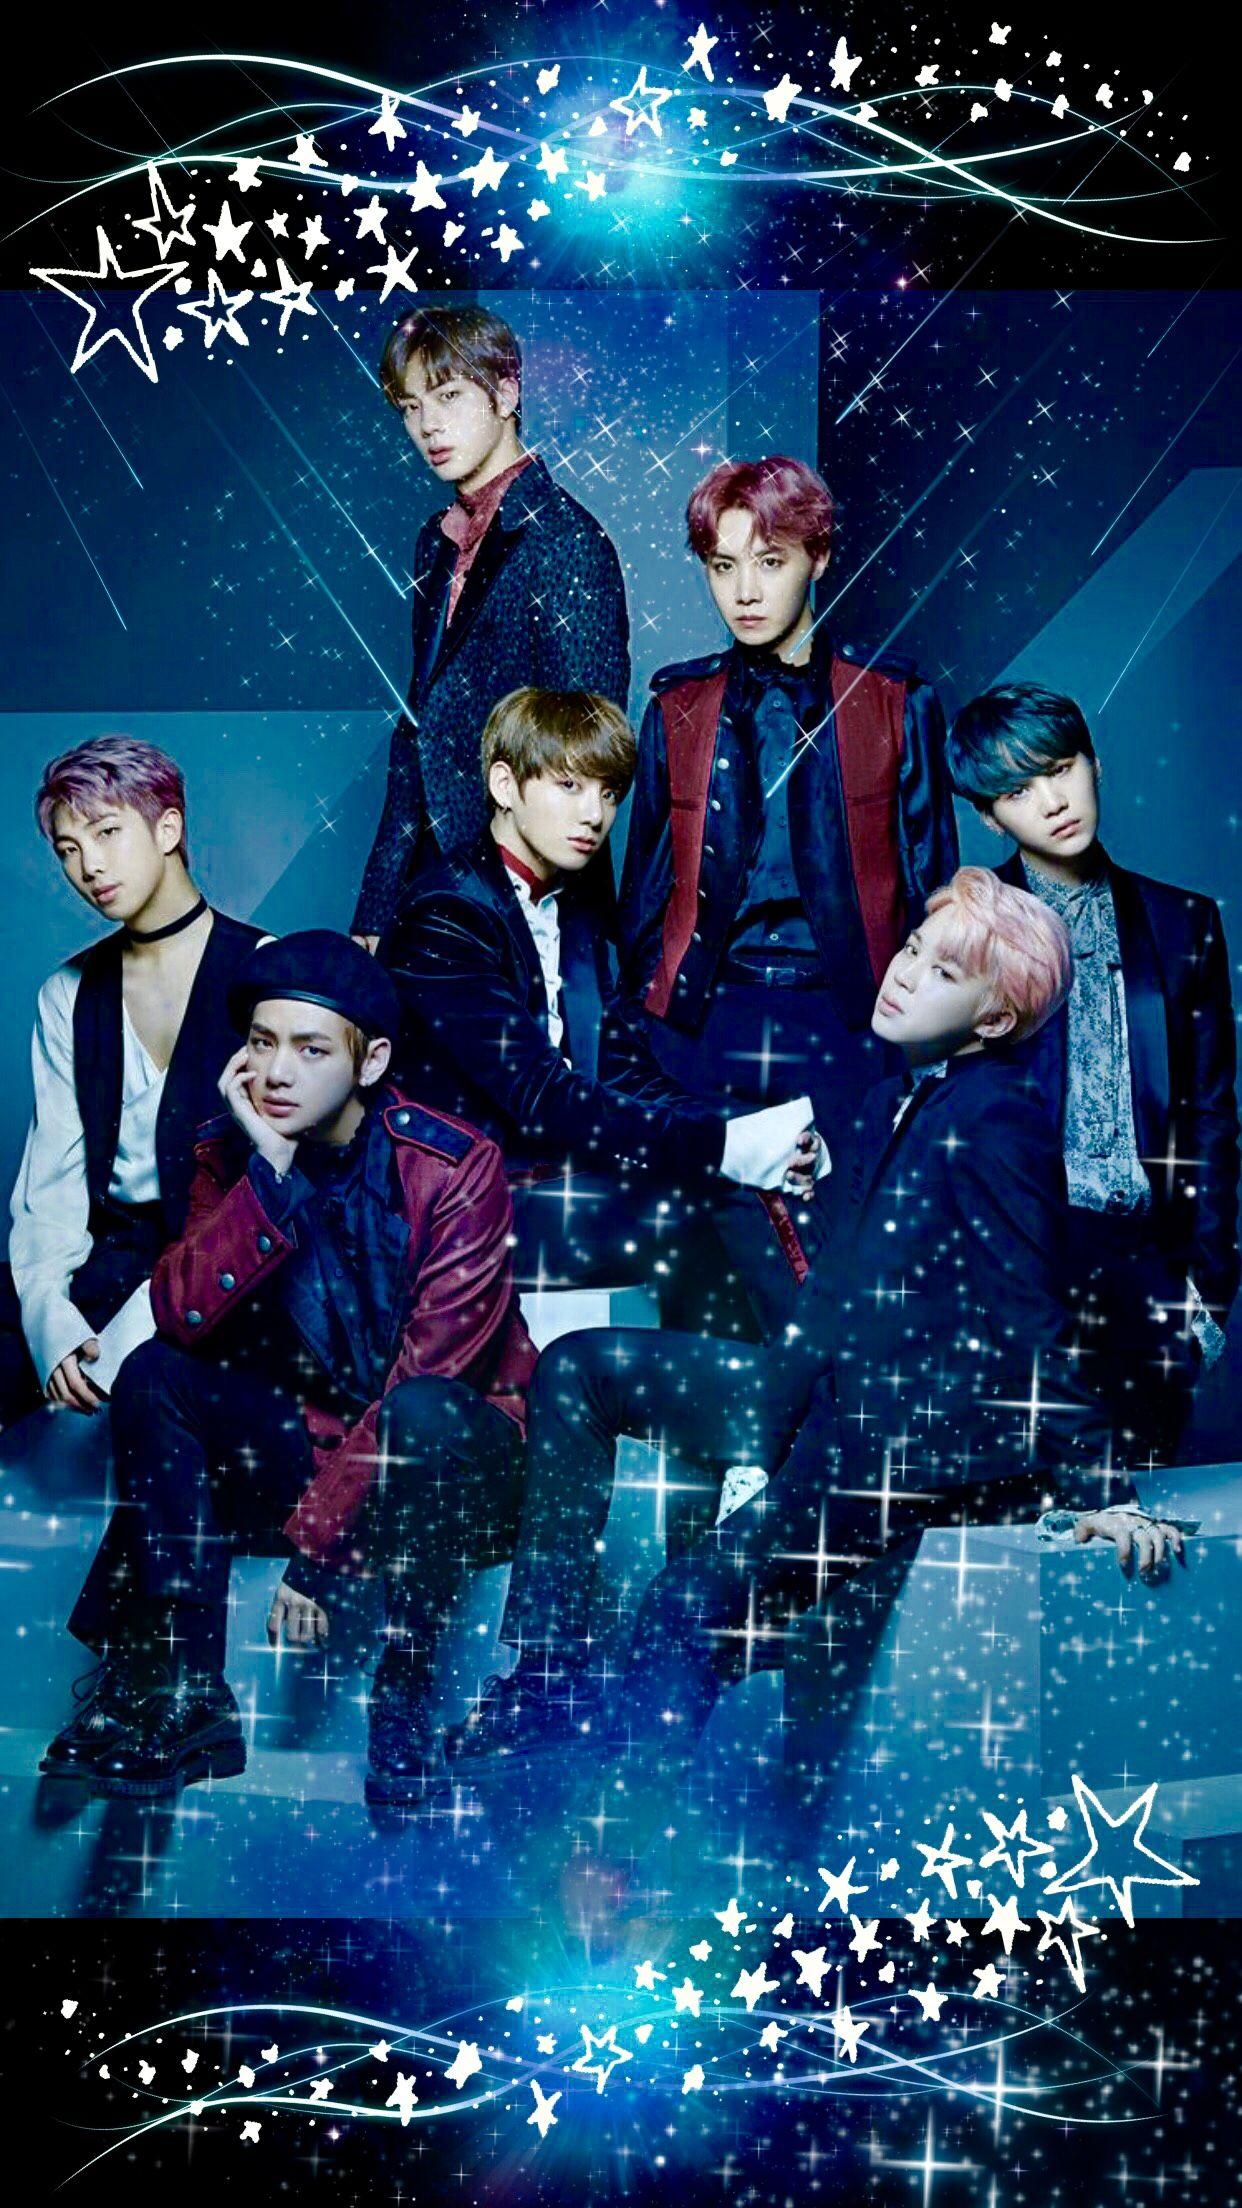 BTS Space wallpaper ❤️❤️ #btswallpaper